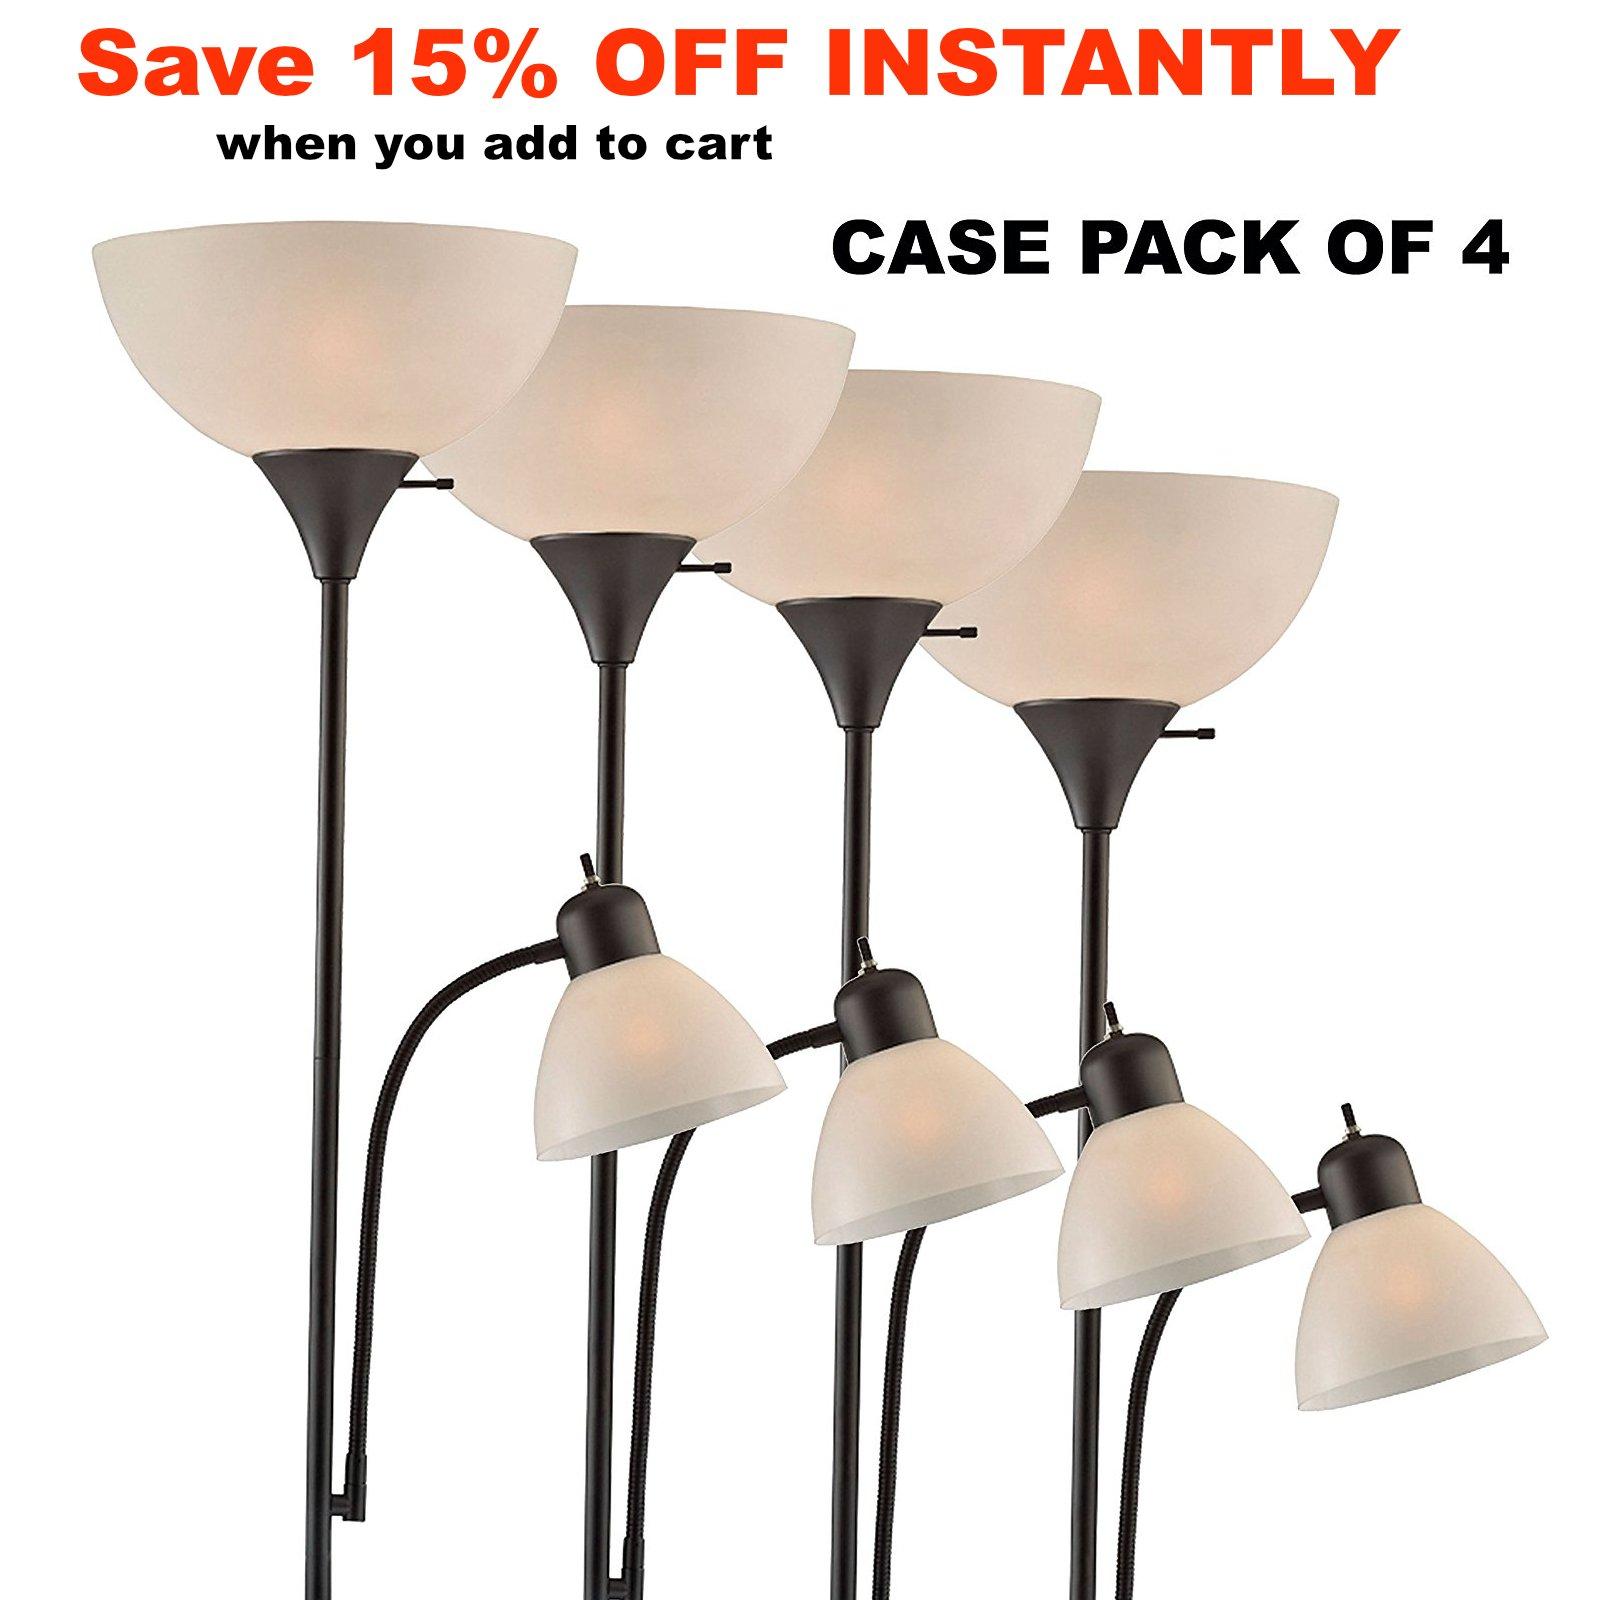 Light Accents 150 Watt Floor Lamp with Side Reading Light - Floor Lamps - Dorm Room Floor Lamp - Floor Lamps for Bedrooms - Kids Floor Lamp - College Floor Lamp (Black (Case of 4)) by Lightaccents (Image #4)